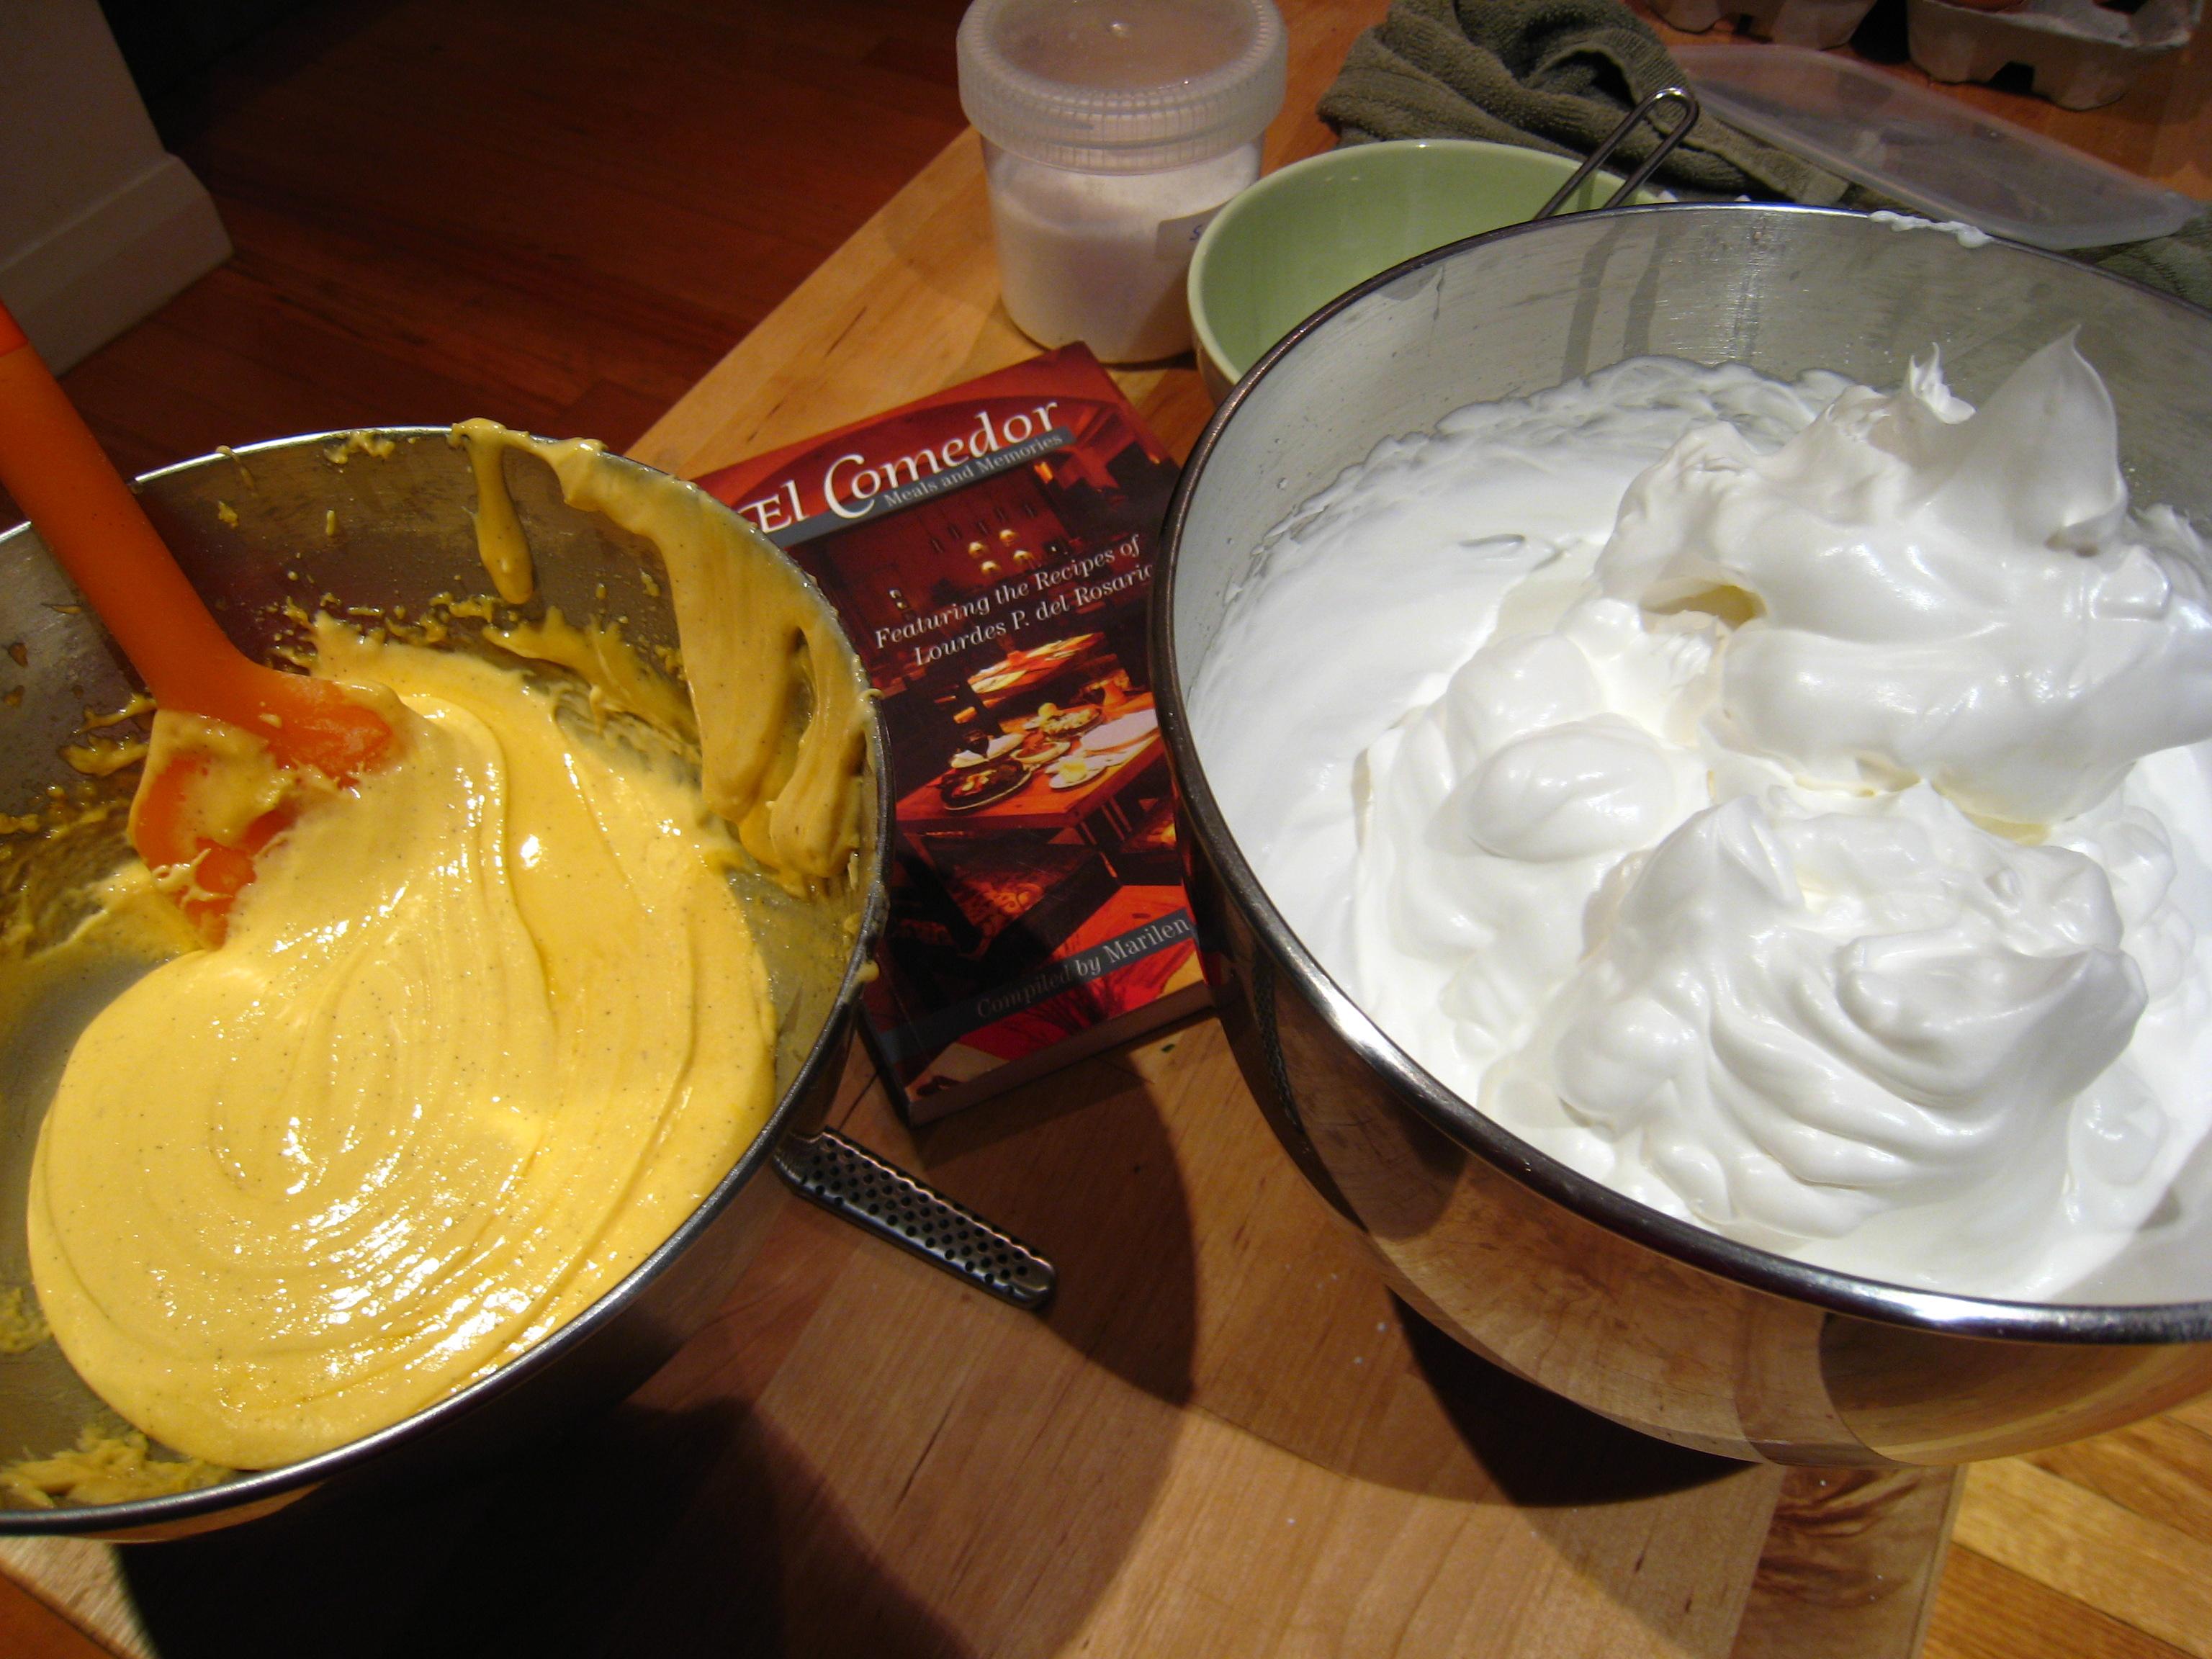 The egg yolk and meringue mixture